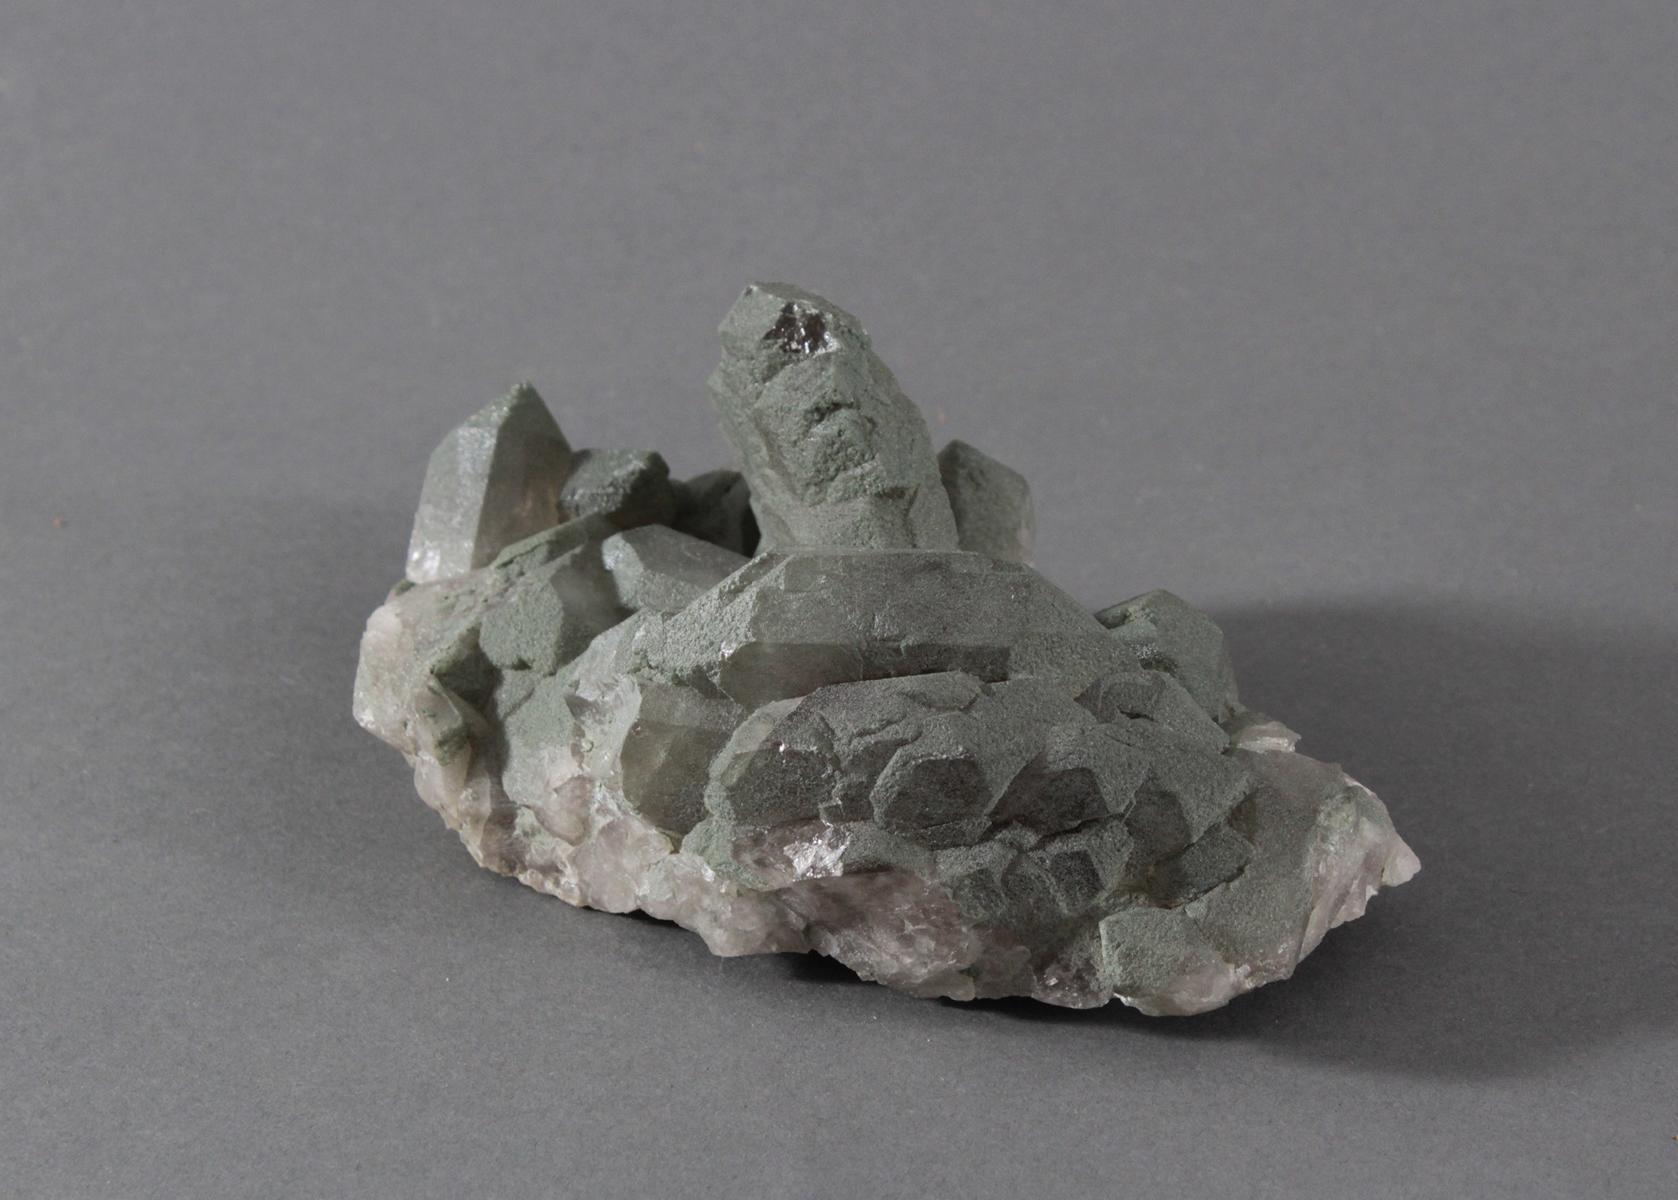 Gwindel-Chlorit cavradi aus Graubünden-3